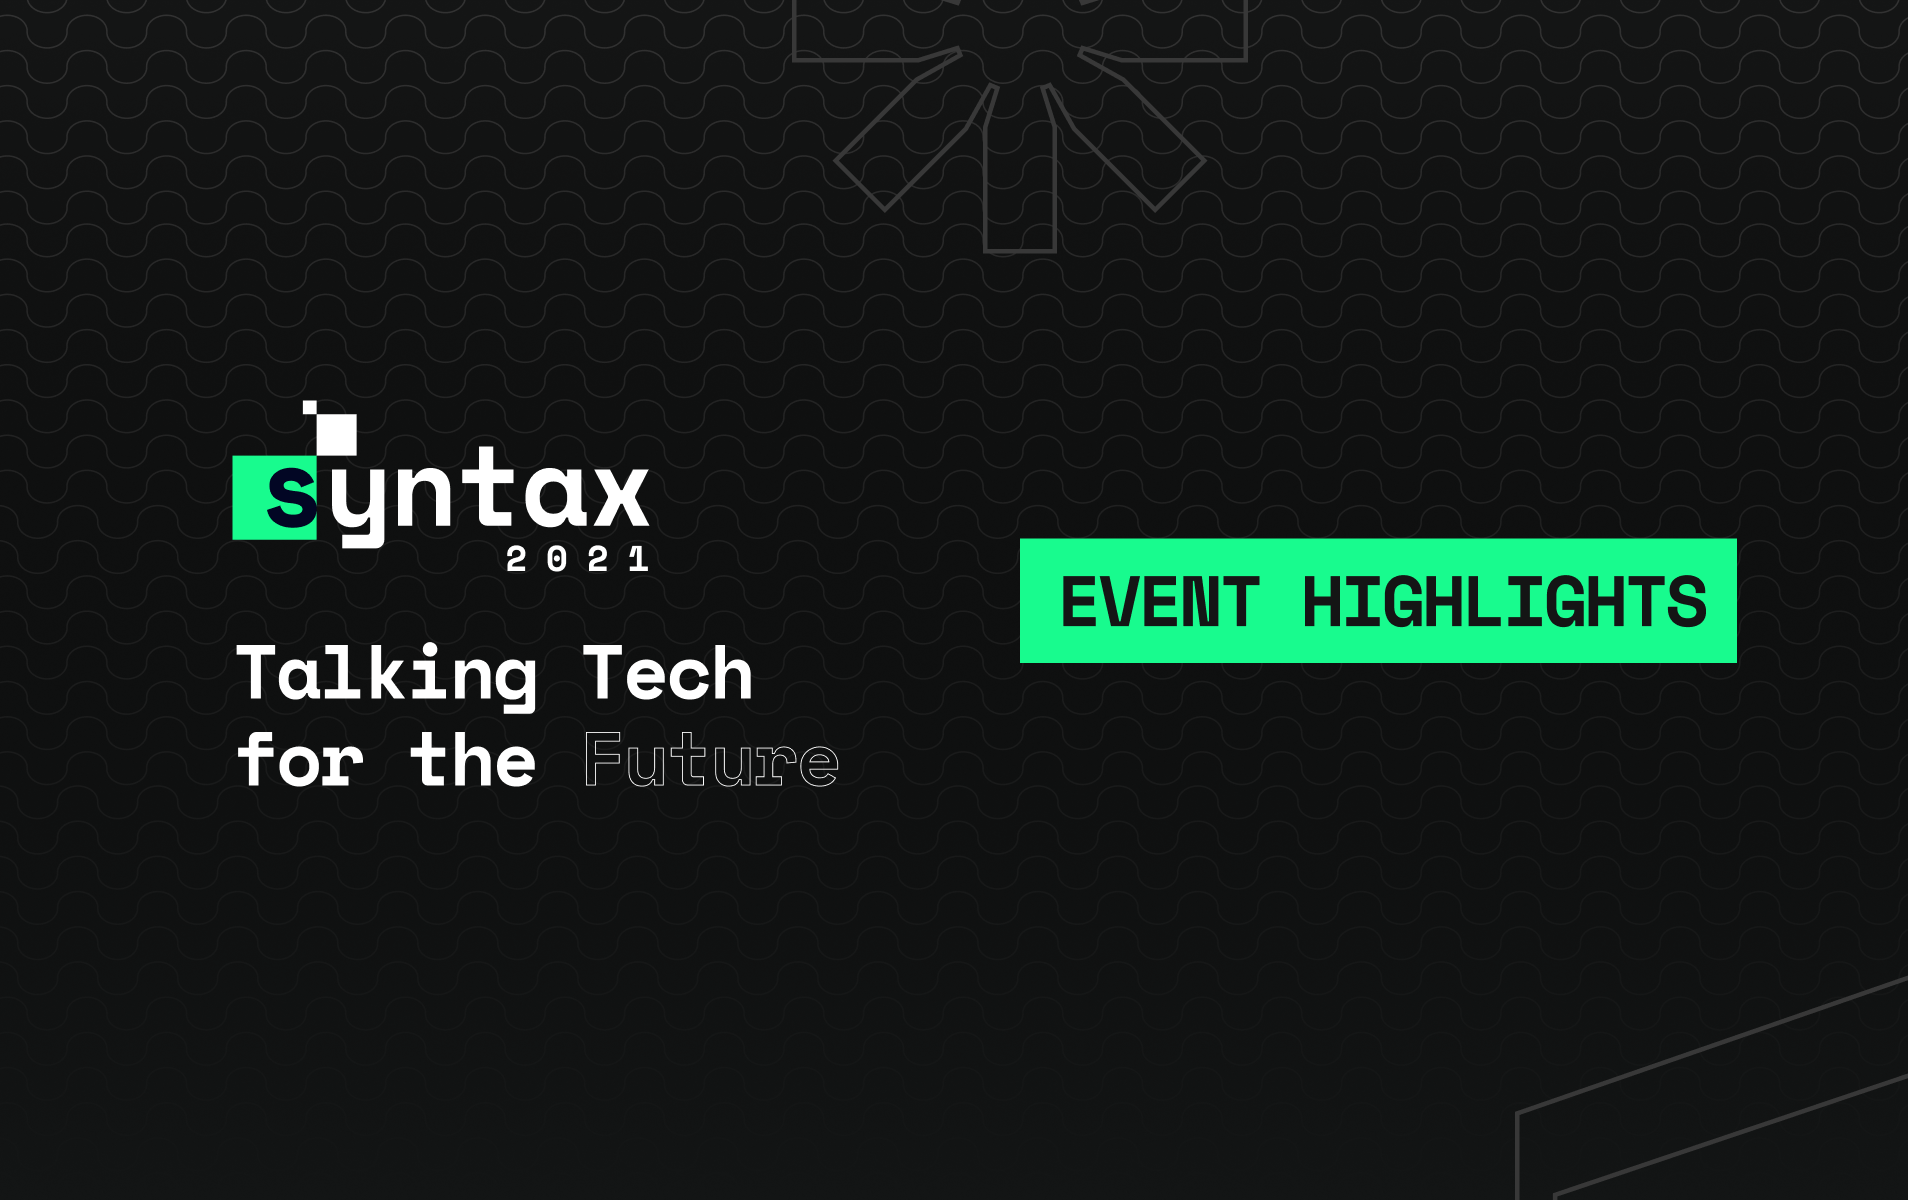 Syntax 2021: Event Recap